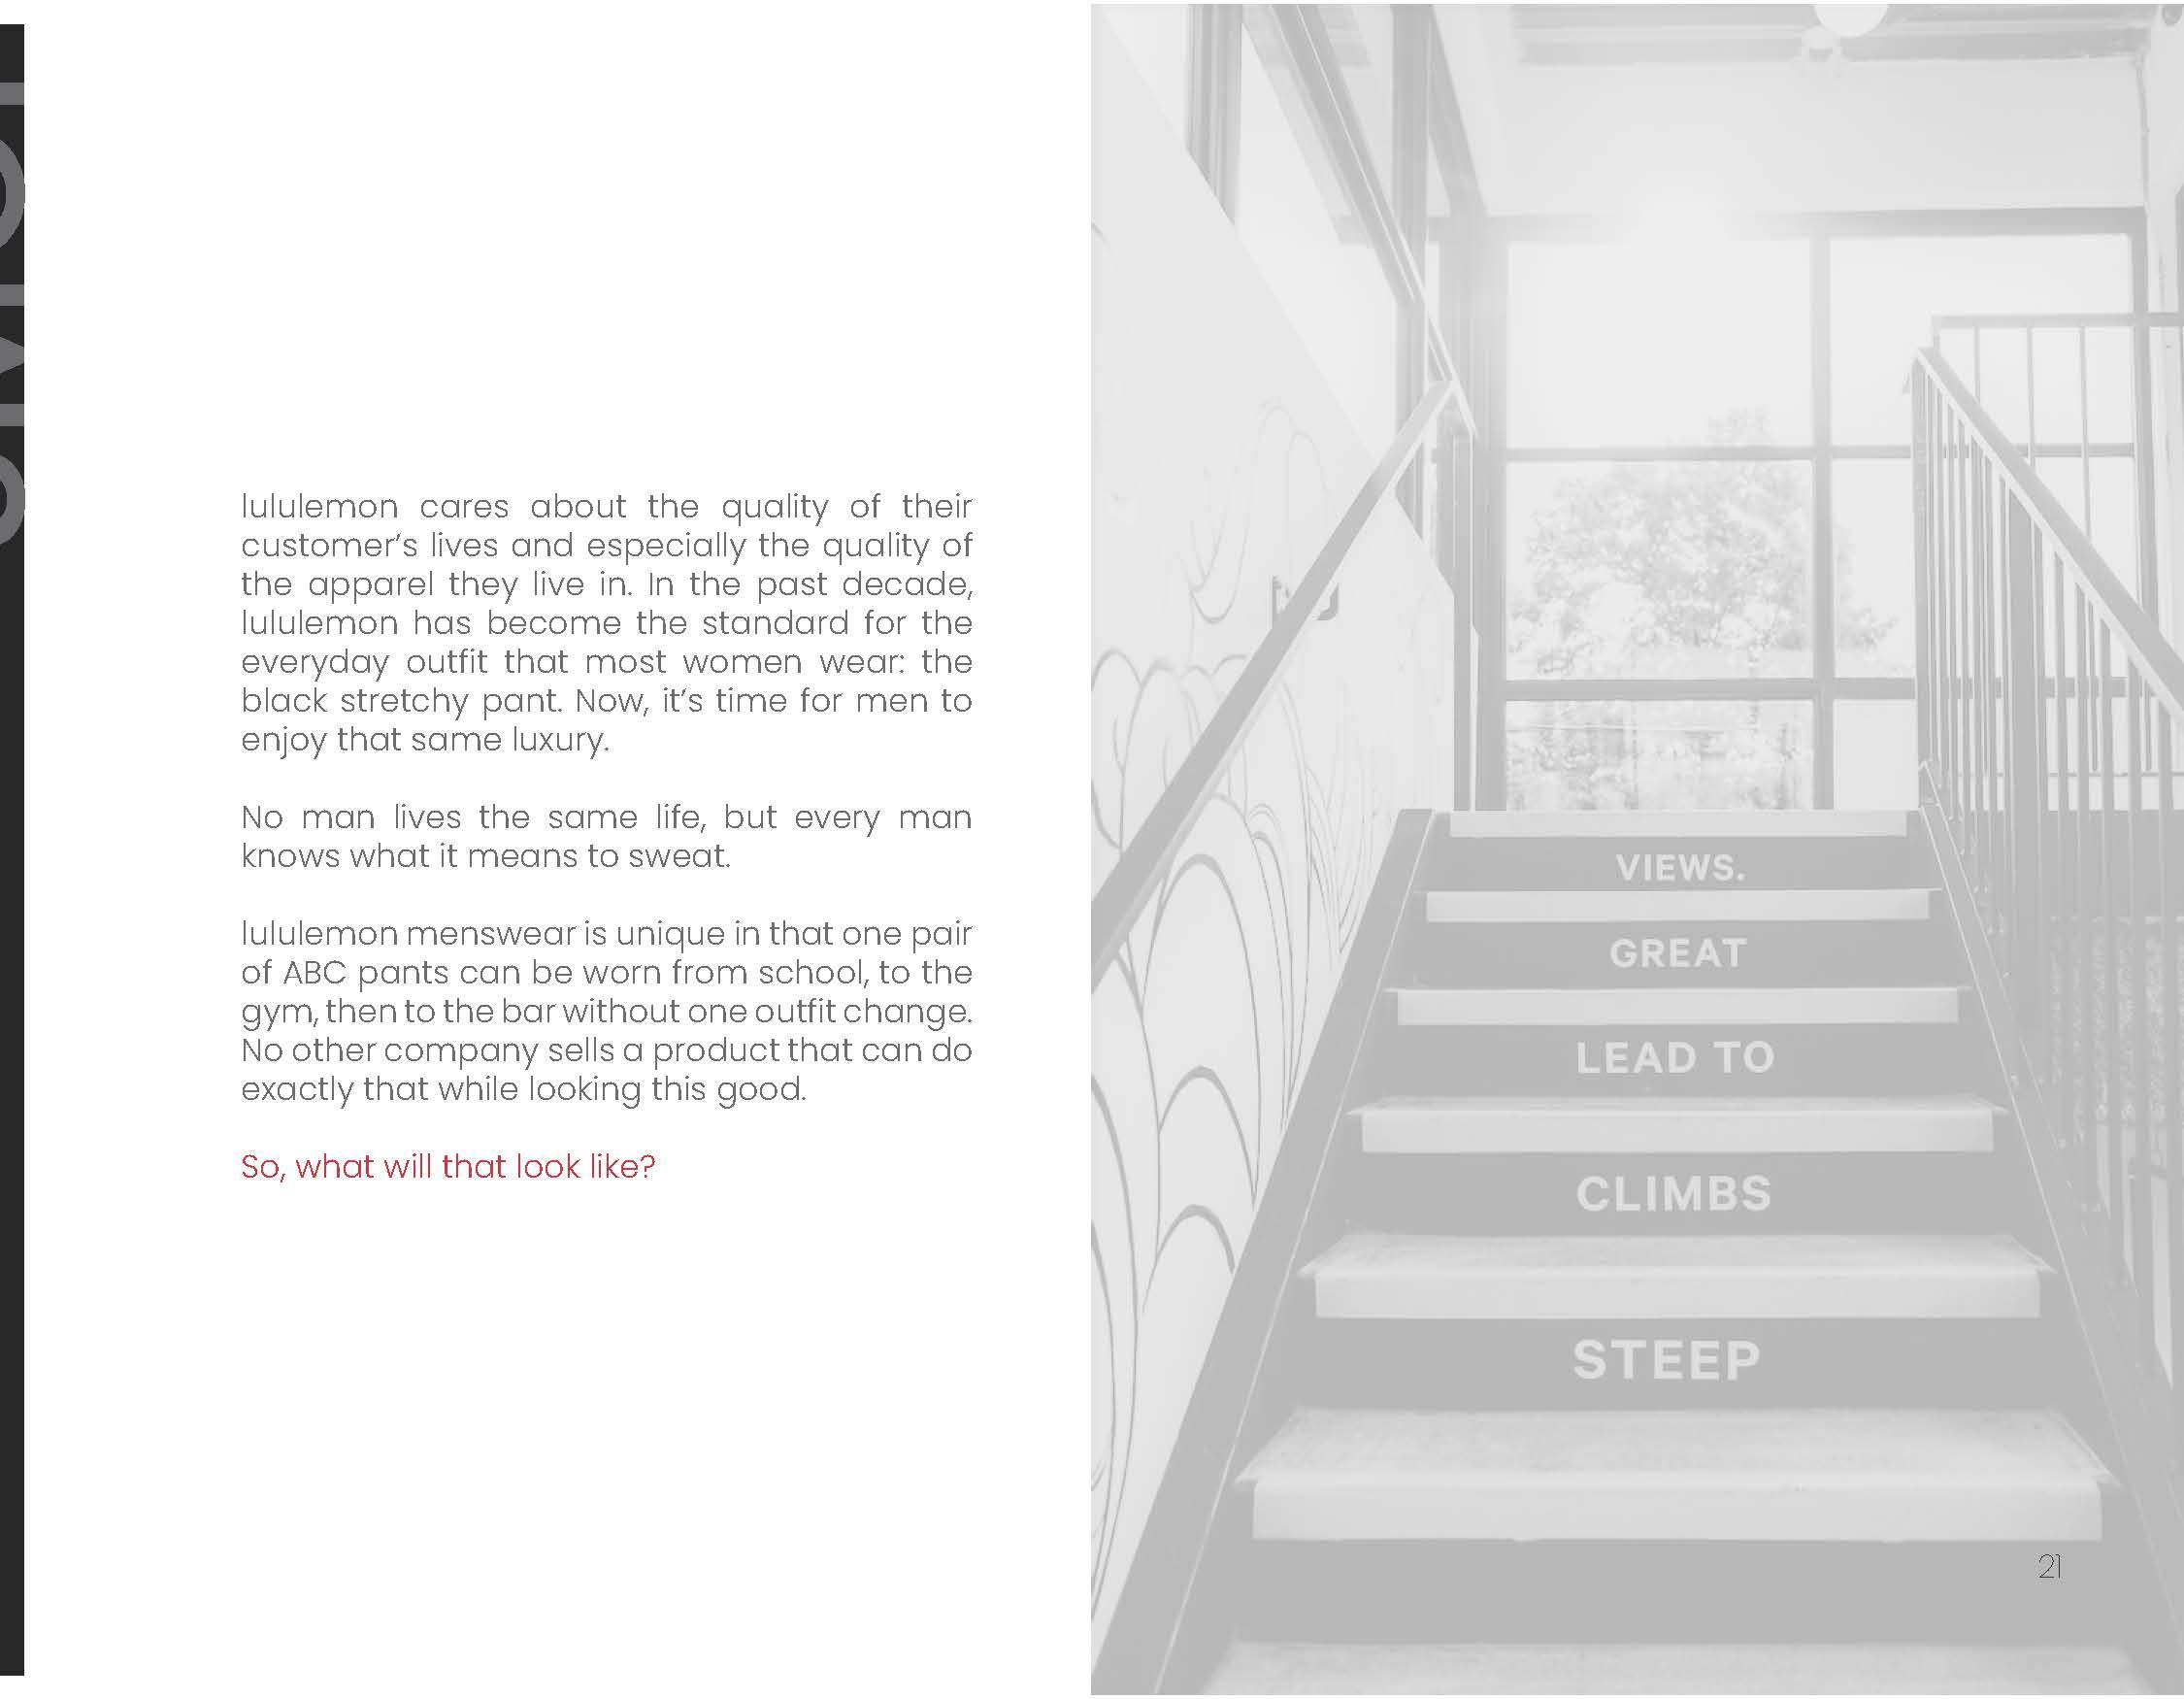 Nellah_FinalPitchBook_Portfolio_lululemon_Page_21.jpg